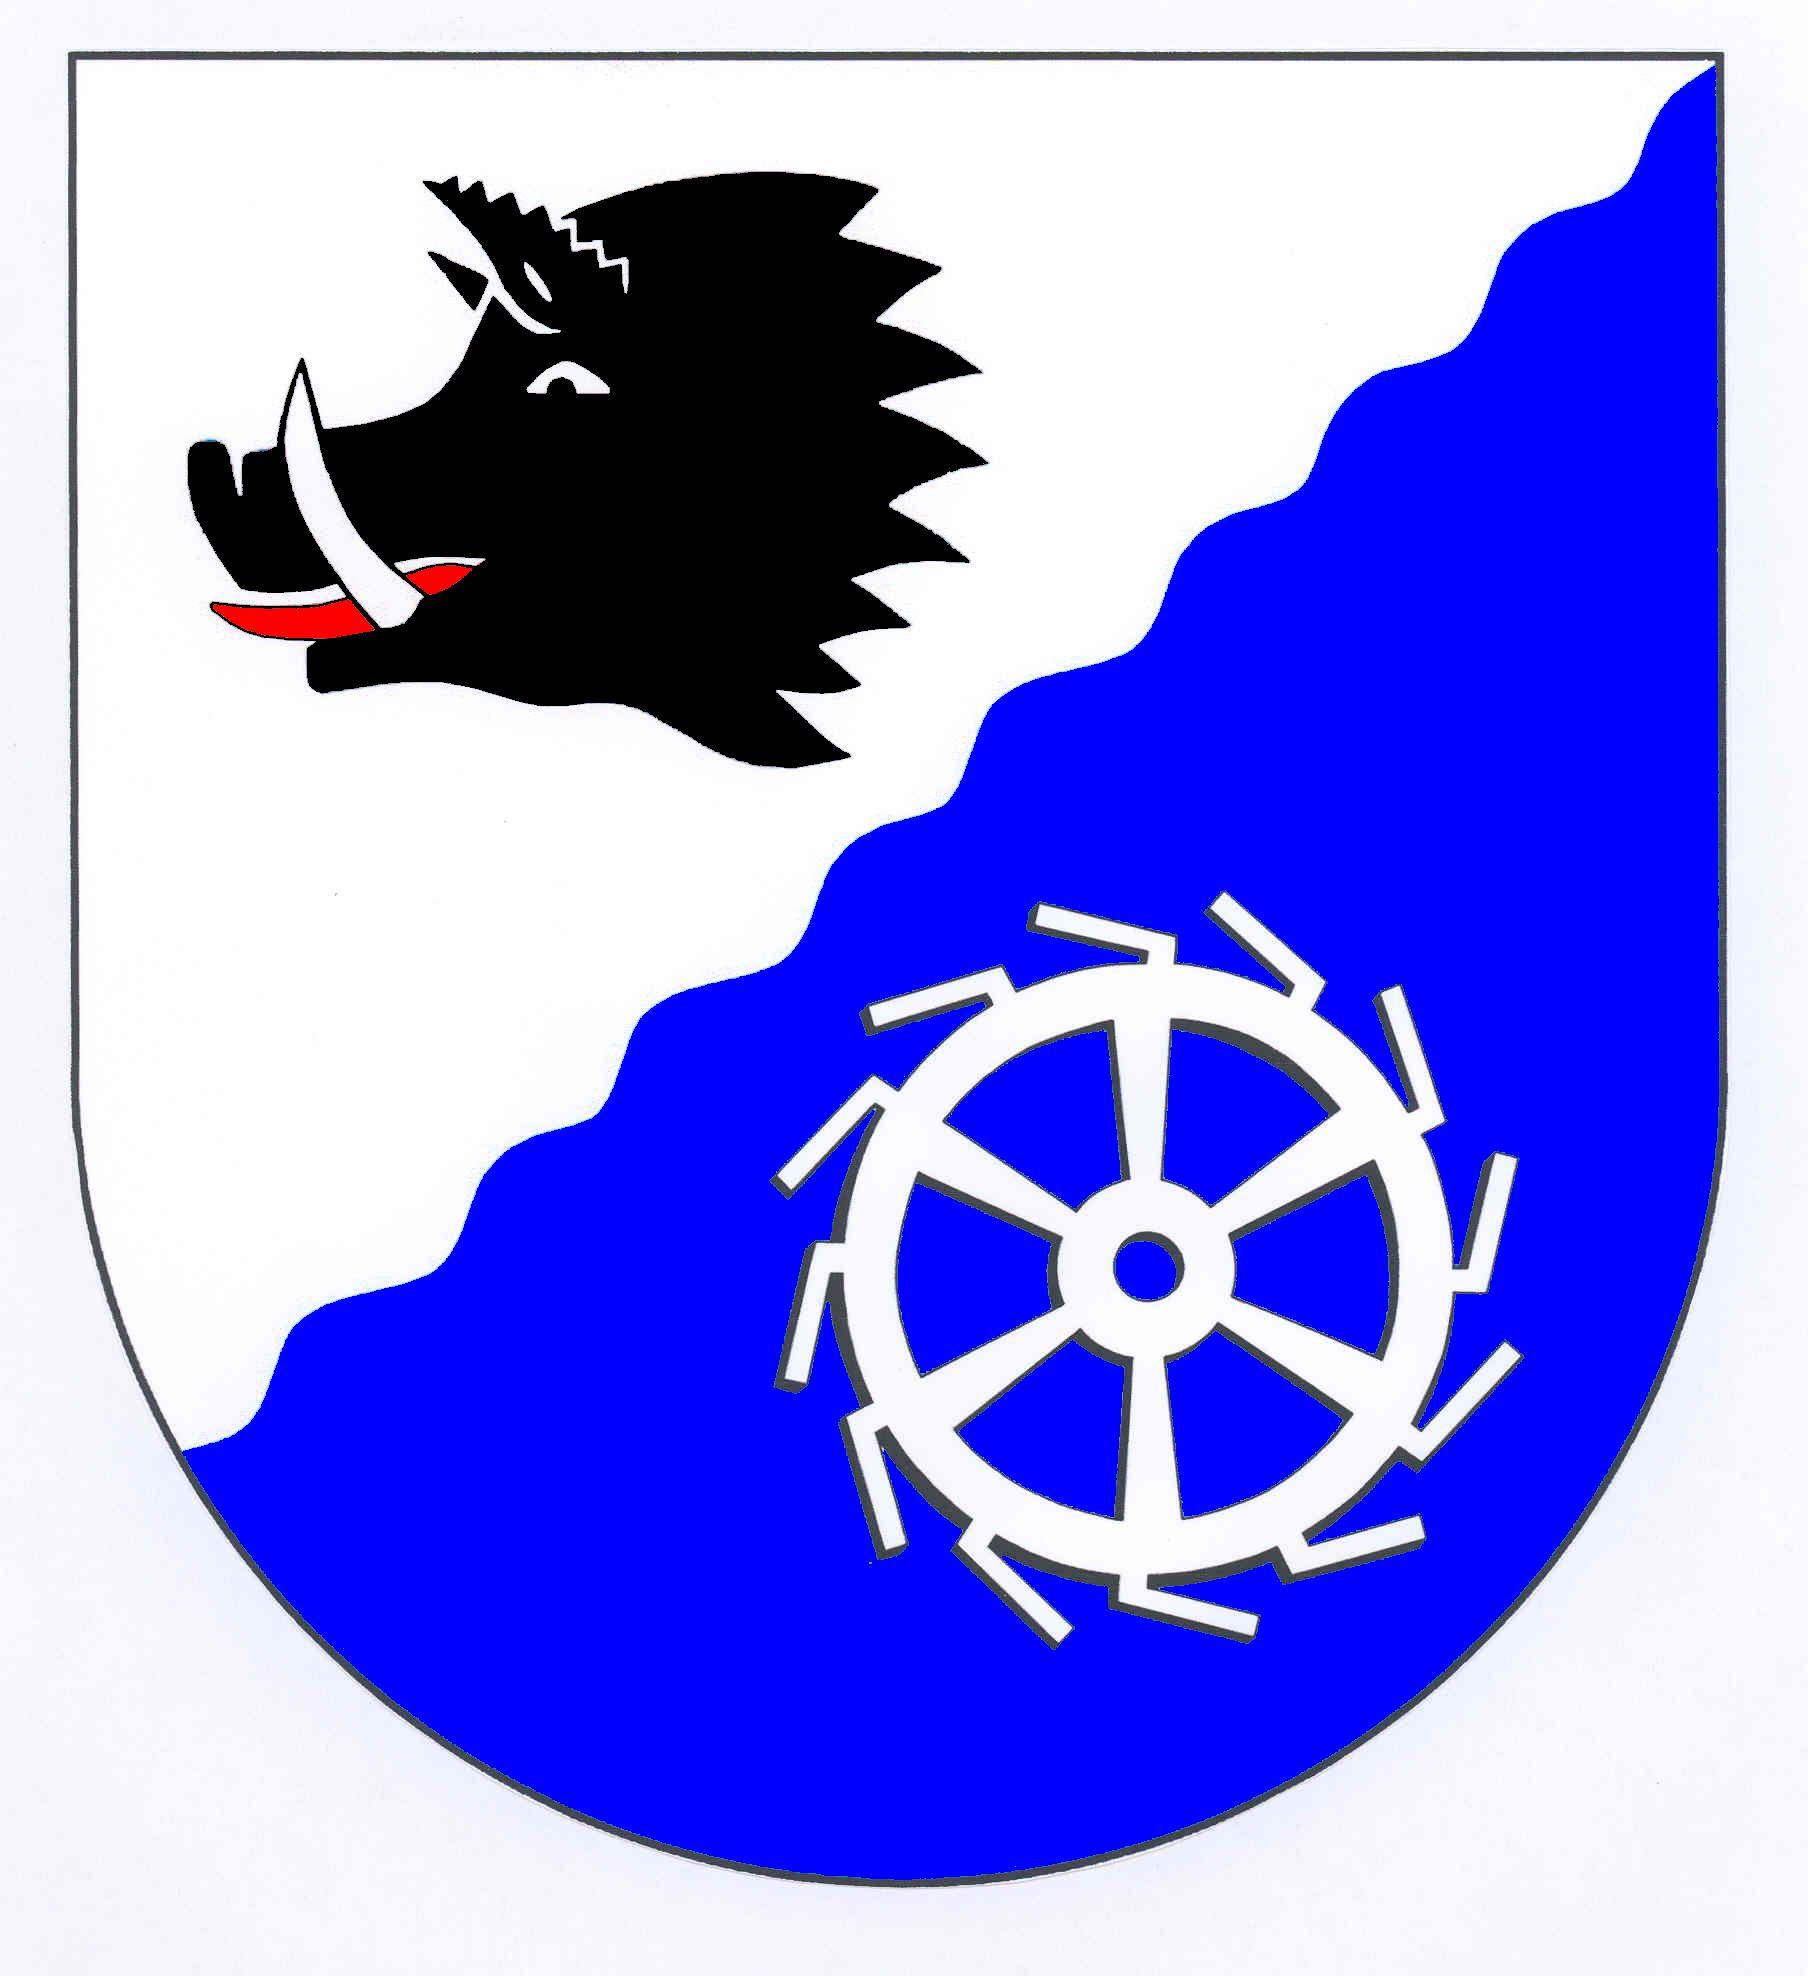 Wappen GemeindeTechelsdorf, Kreis Rendsburg-Eckernförde